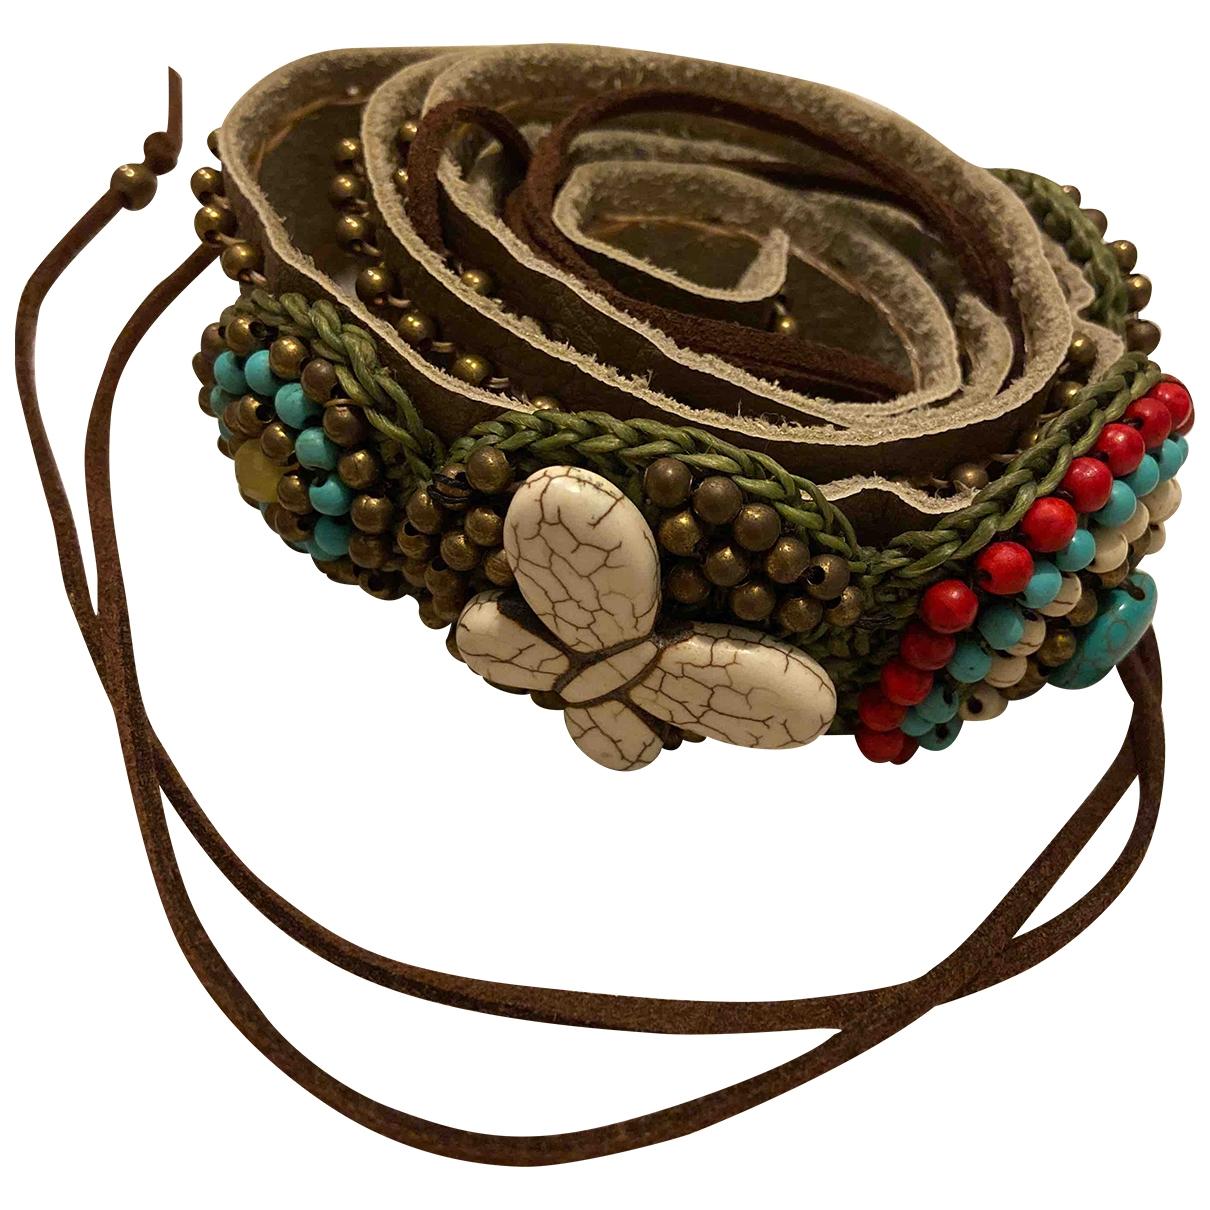 Cinturon Motifs Coquillages de Cuero Non Signe / Unsigned